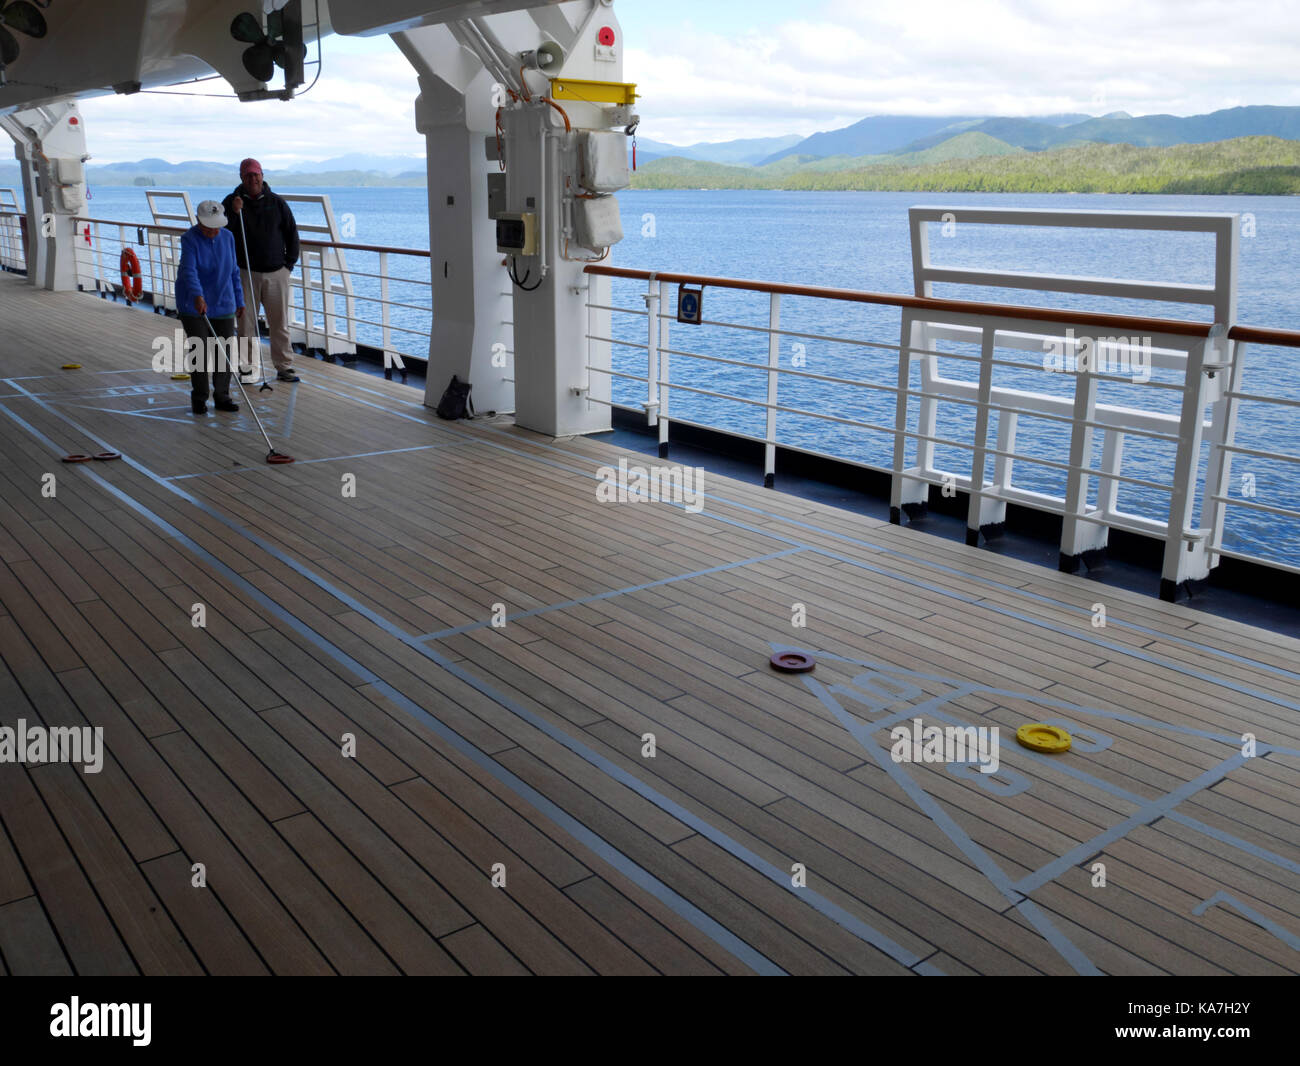 how to play shuffleboard on a cruise ship